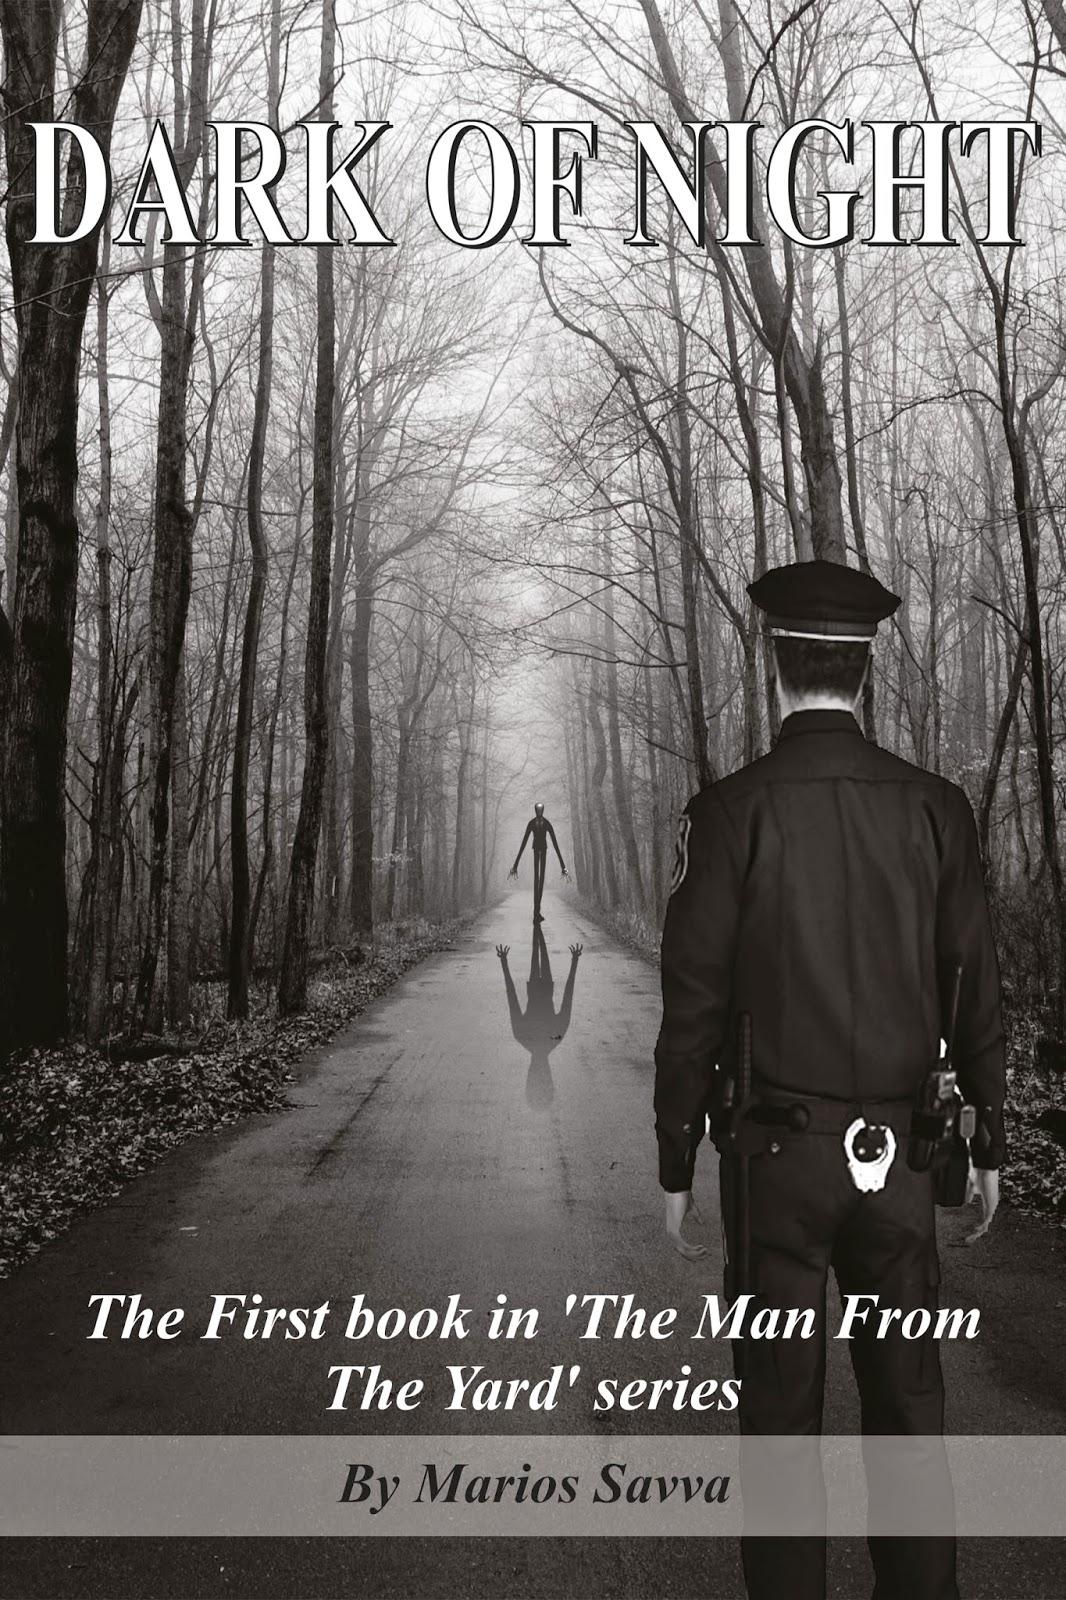 dark of night, the man from the yard, marios savva, thriller, suspense, horror, novel